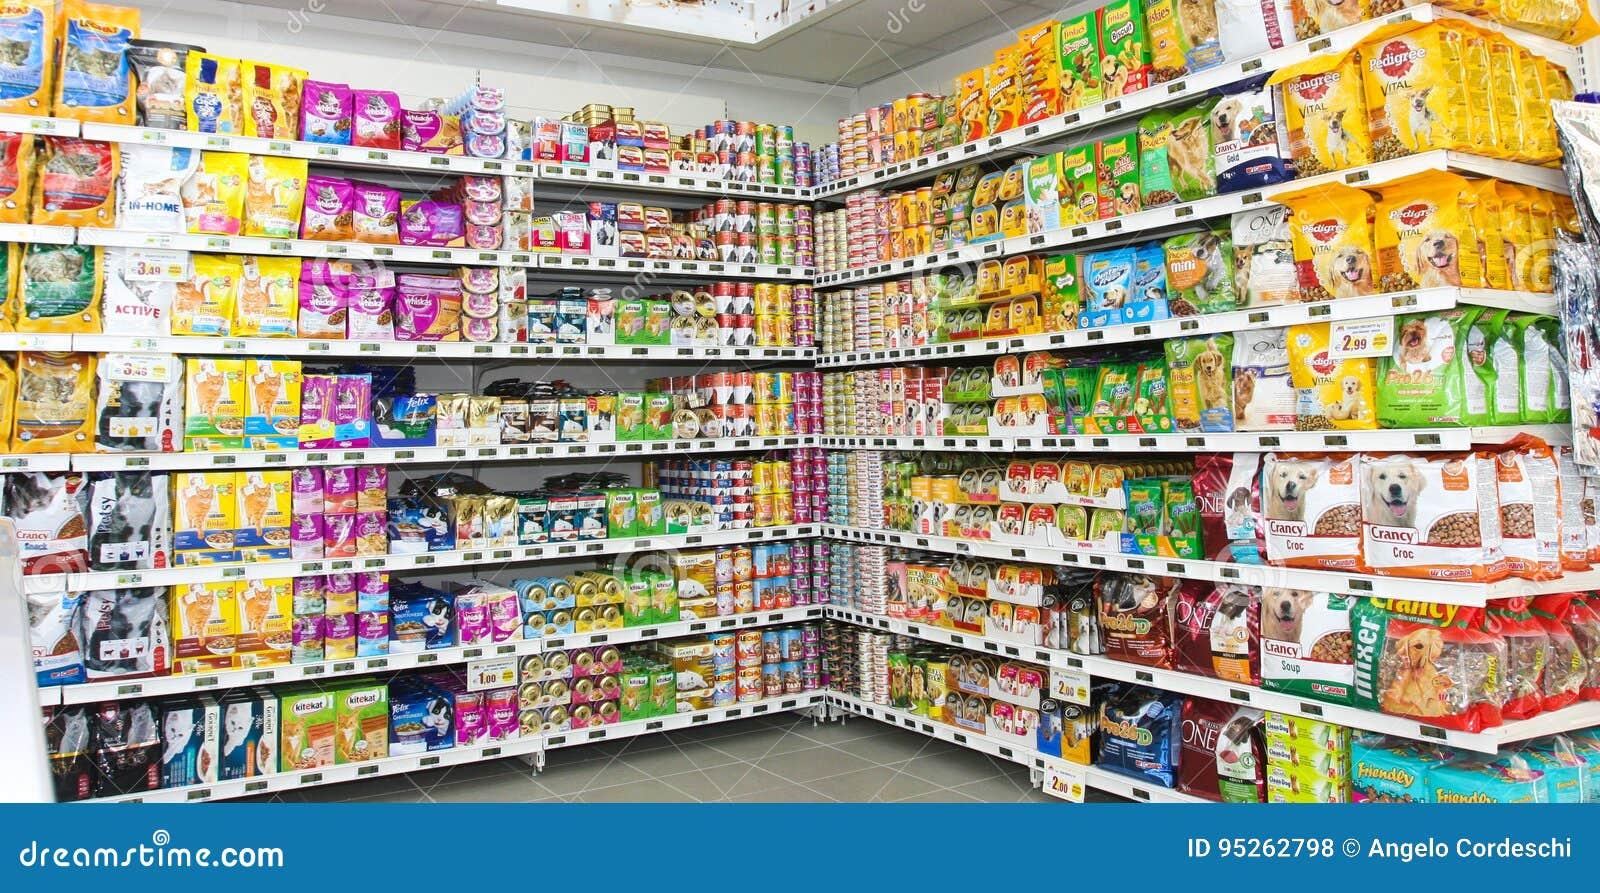 pet food store shelving shelf unit editorial stock photo. Black Bedroom Furniture Sets. Home Design Ideas